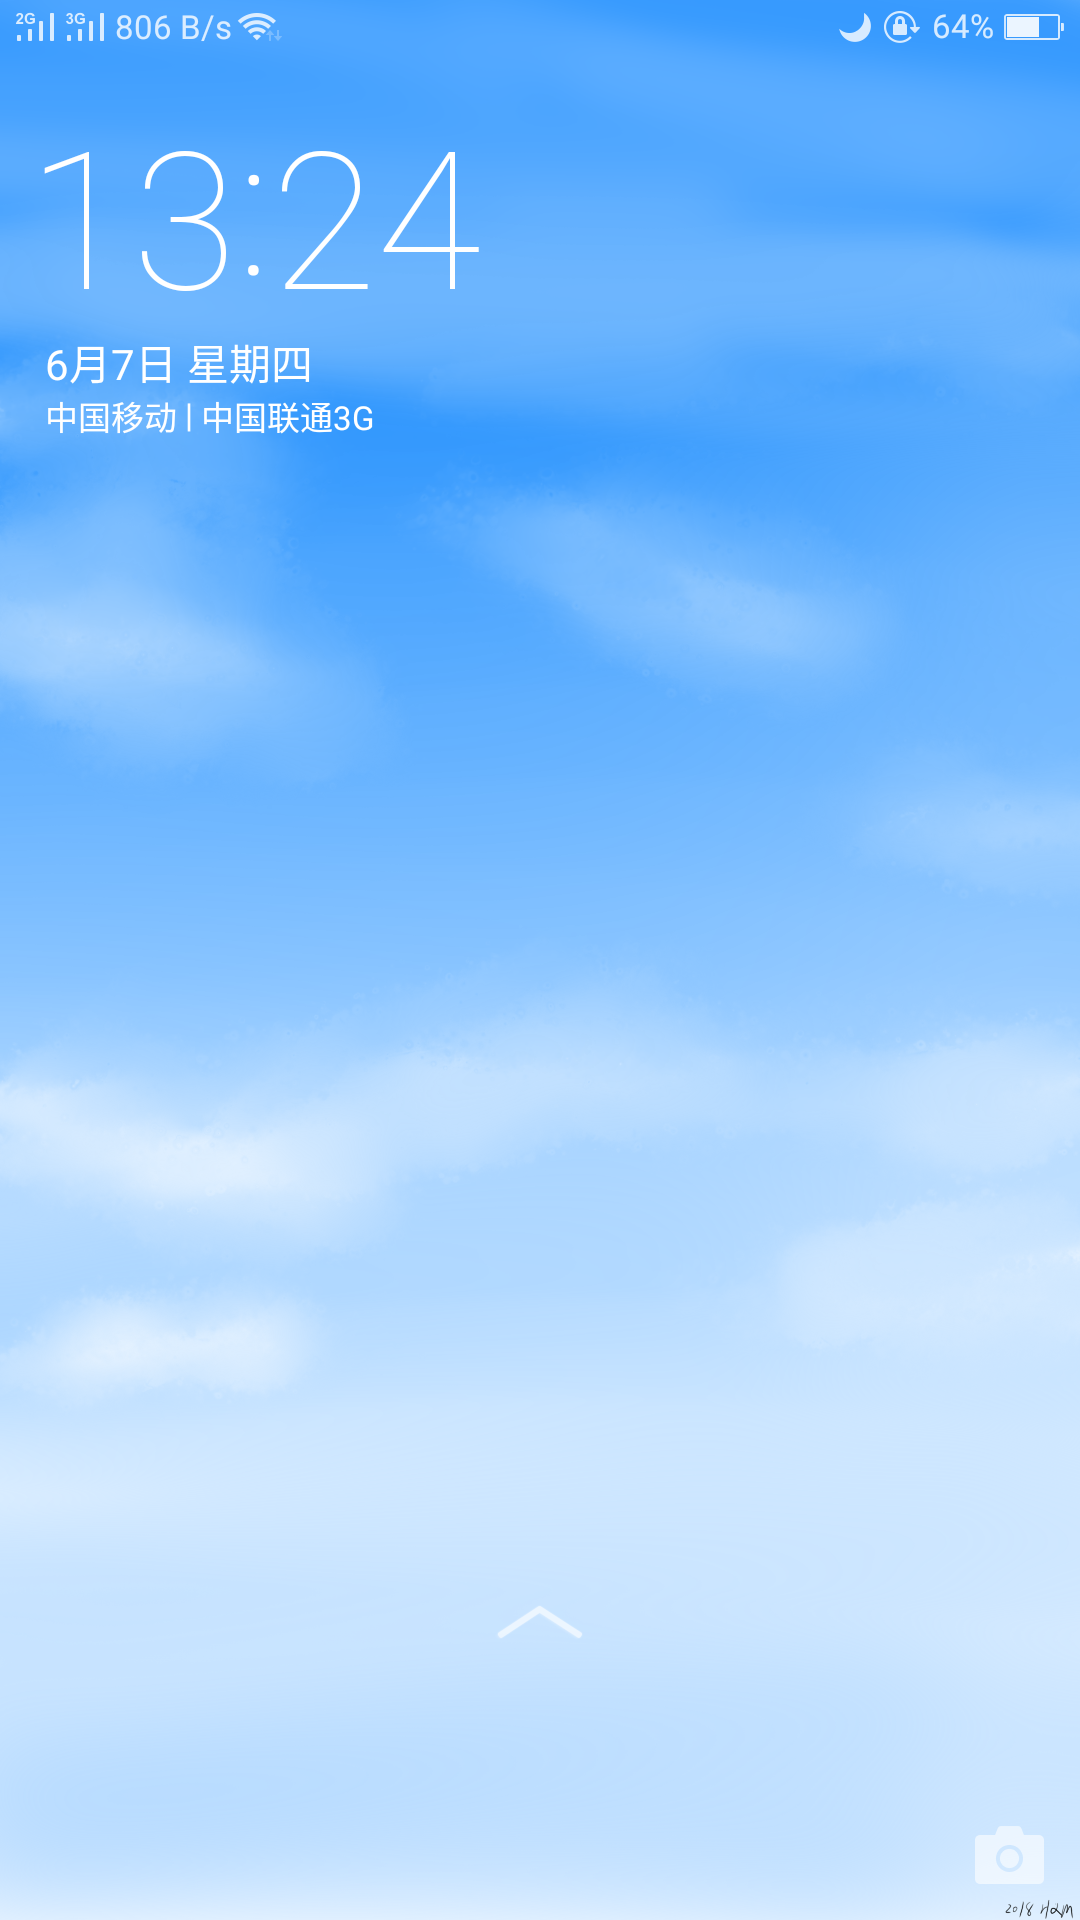 Screenshot_2018-06-07-13-24-44-82.png